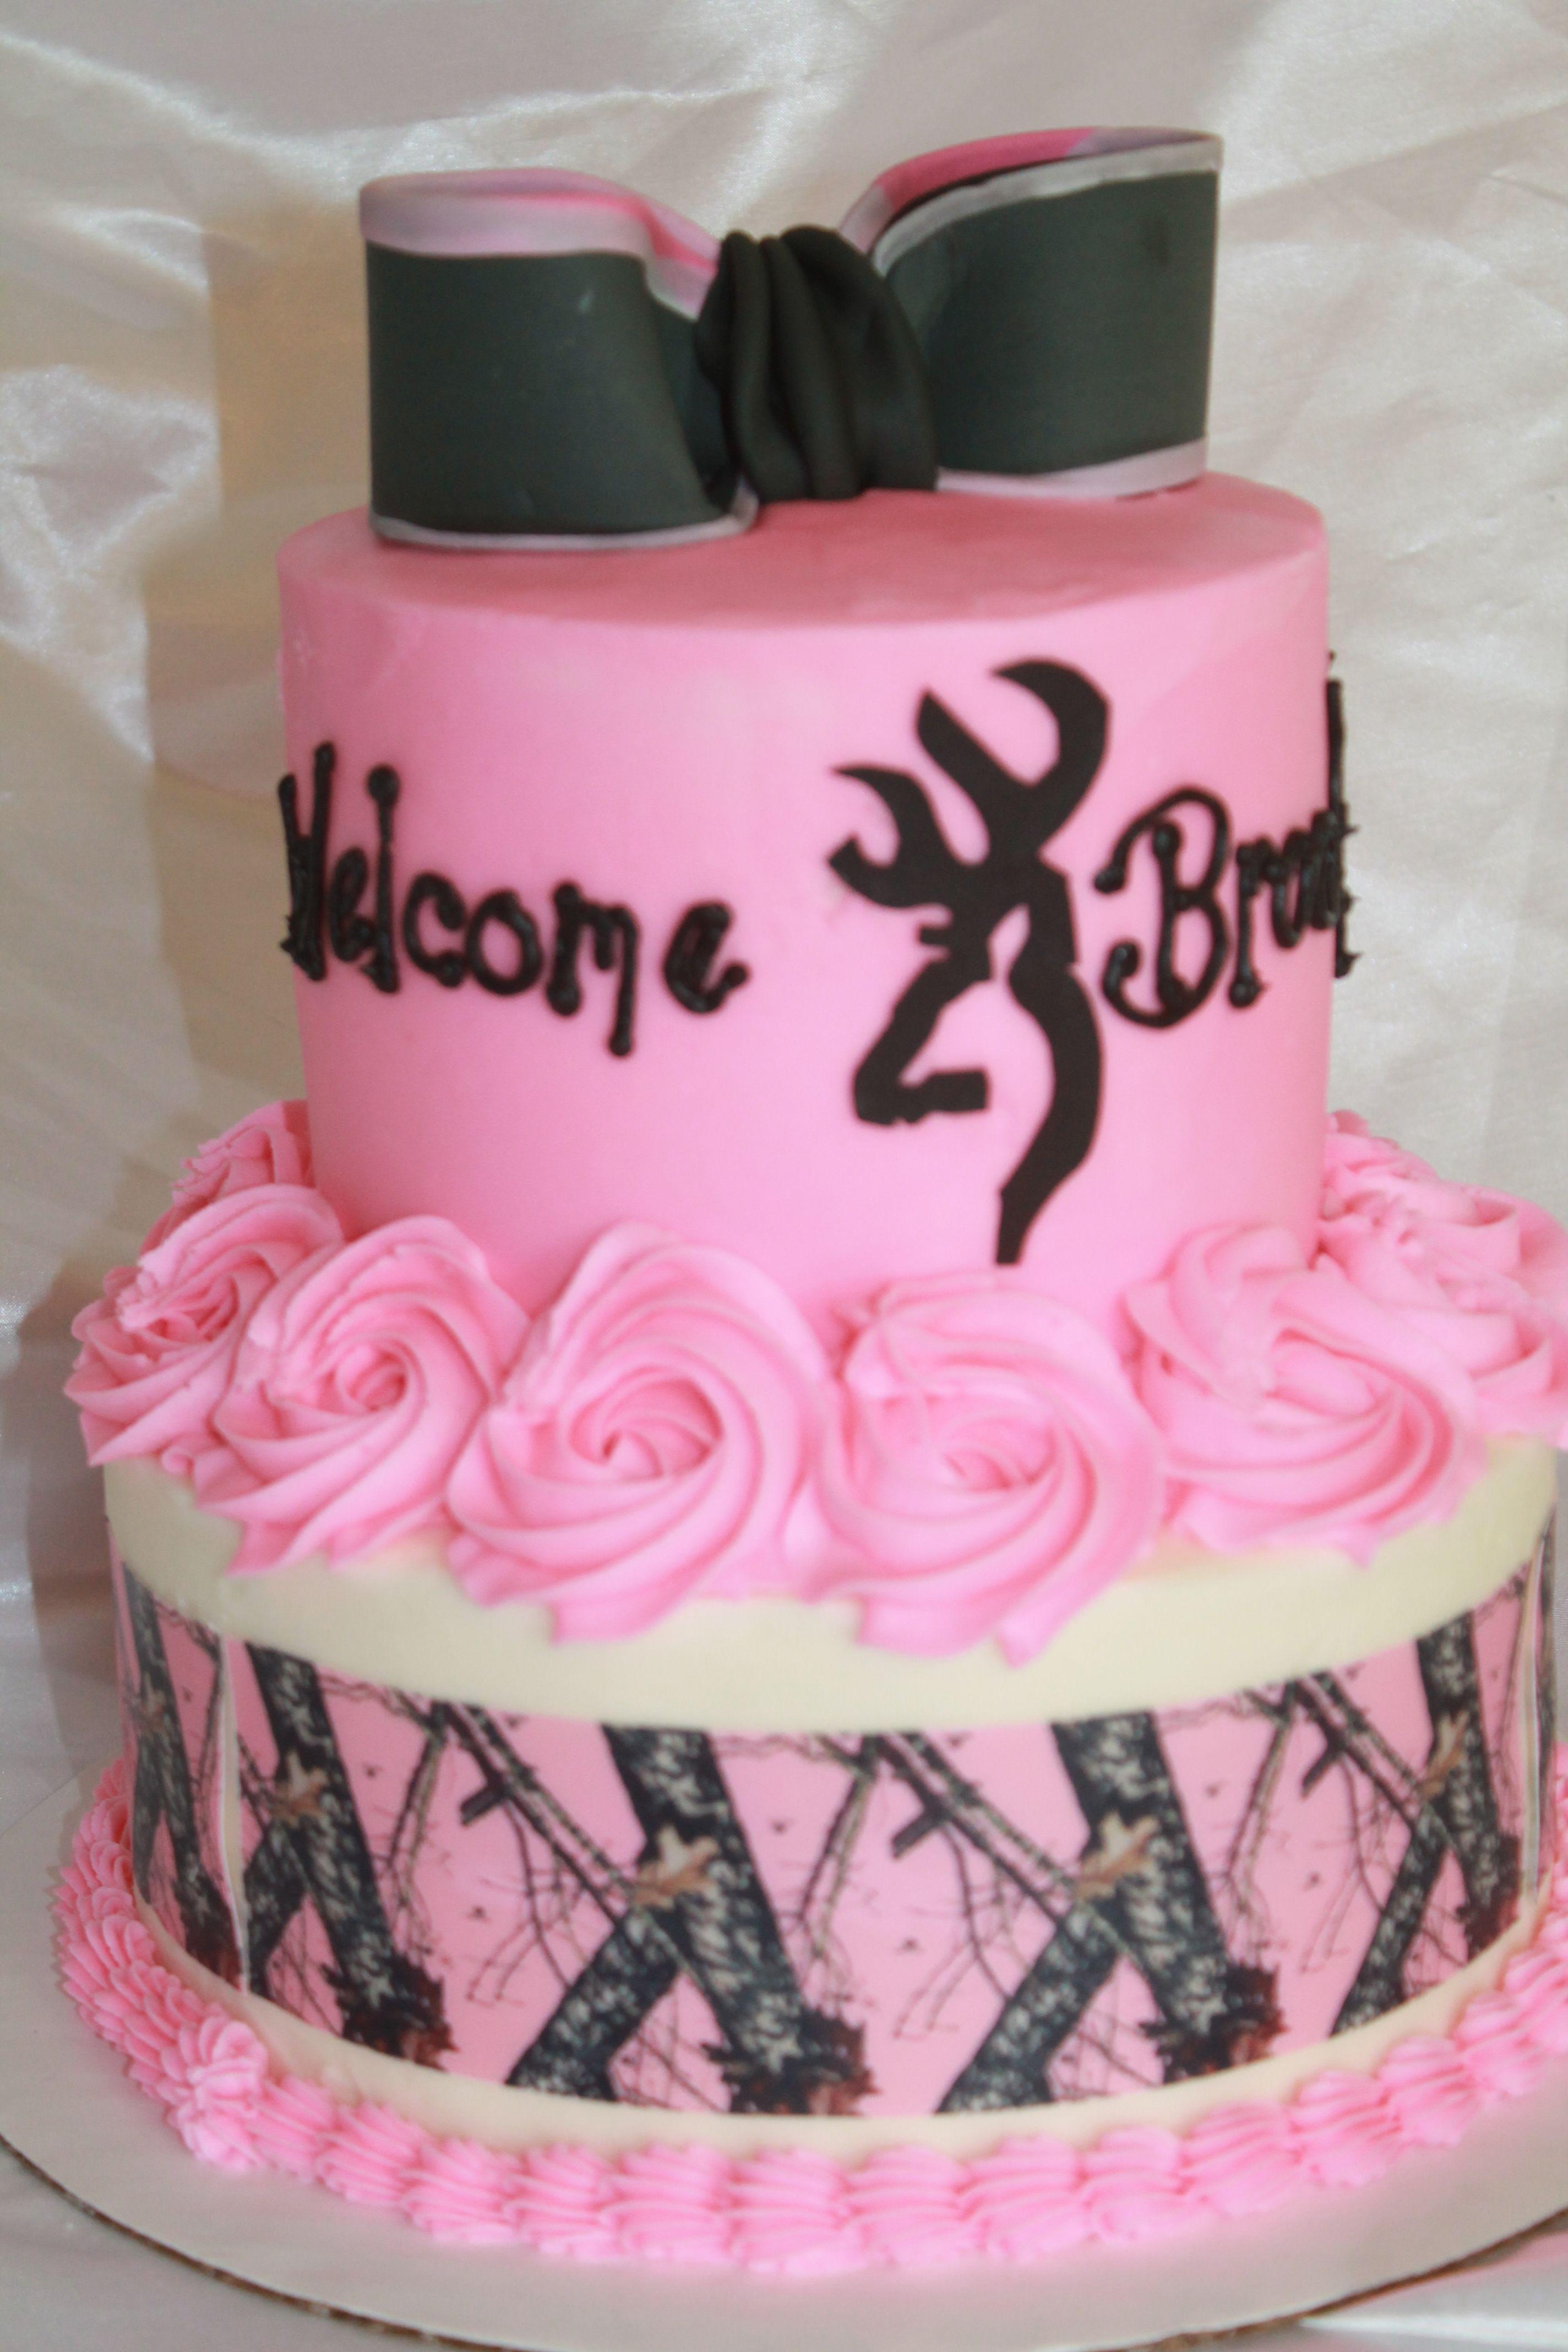 Wel e baby girl camo cake Cakes I ve made Pinterest